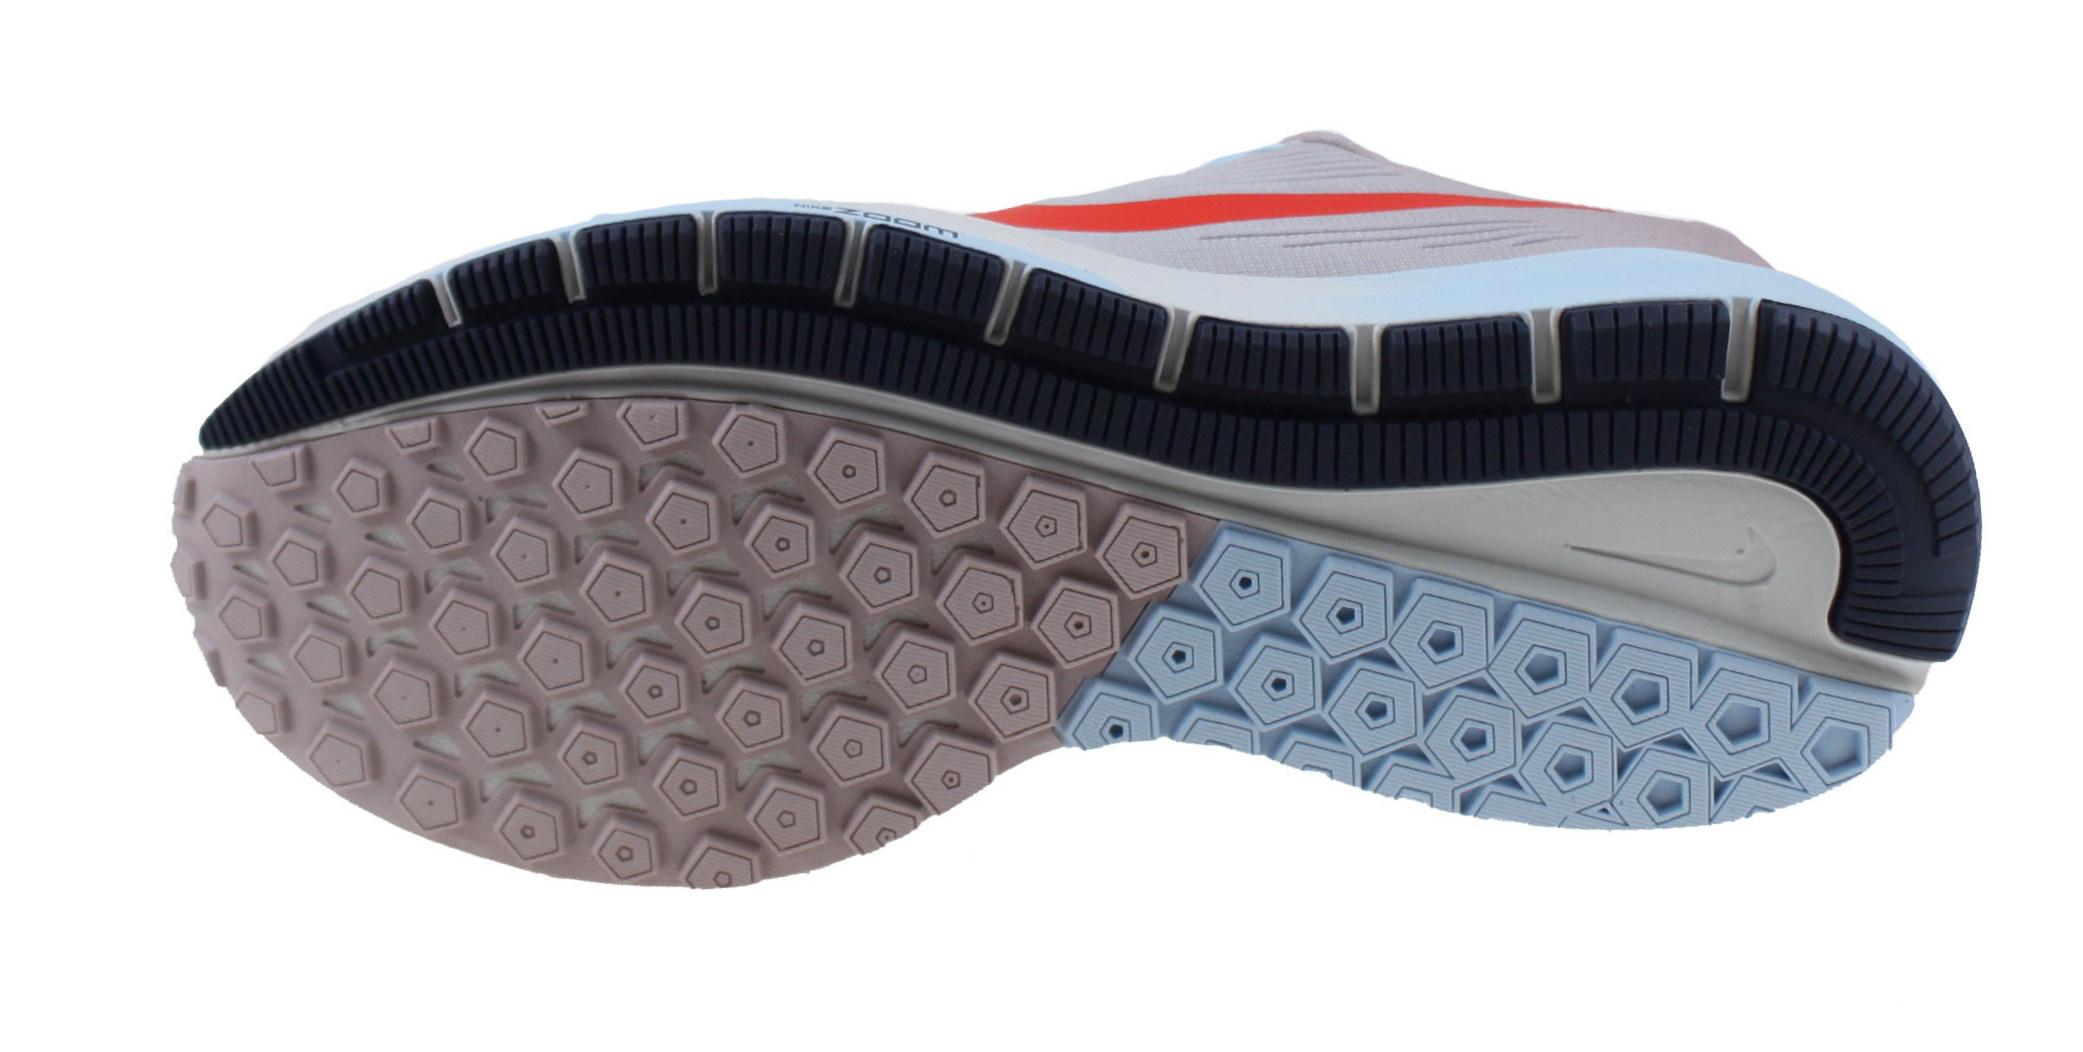 60580778e31 904701 006 Vast Grey/Elemental Rose Cobalt Tint Habanero Red. Product  afbeelding Product afbeelding Product afbeelding Product afbeelding. Nike